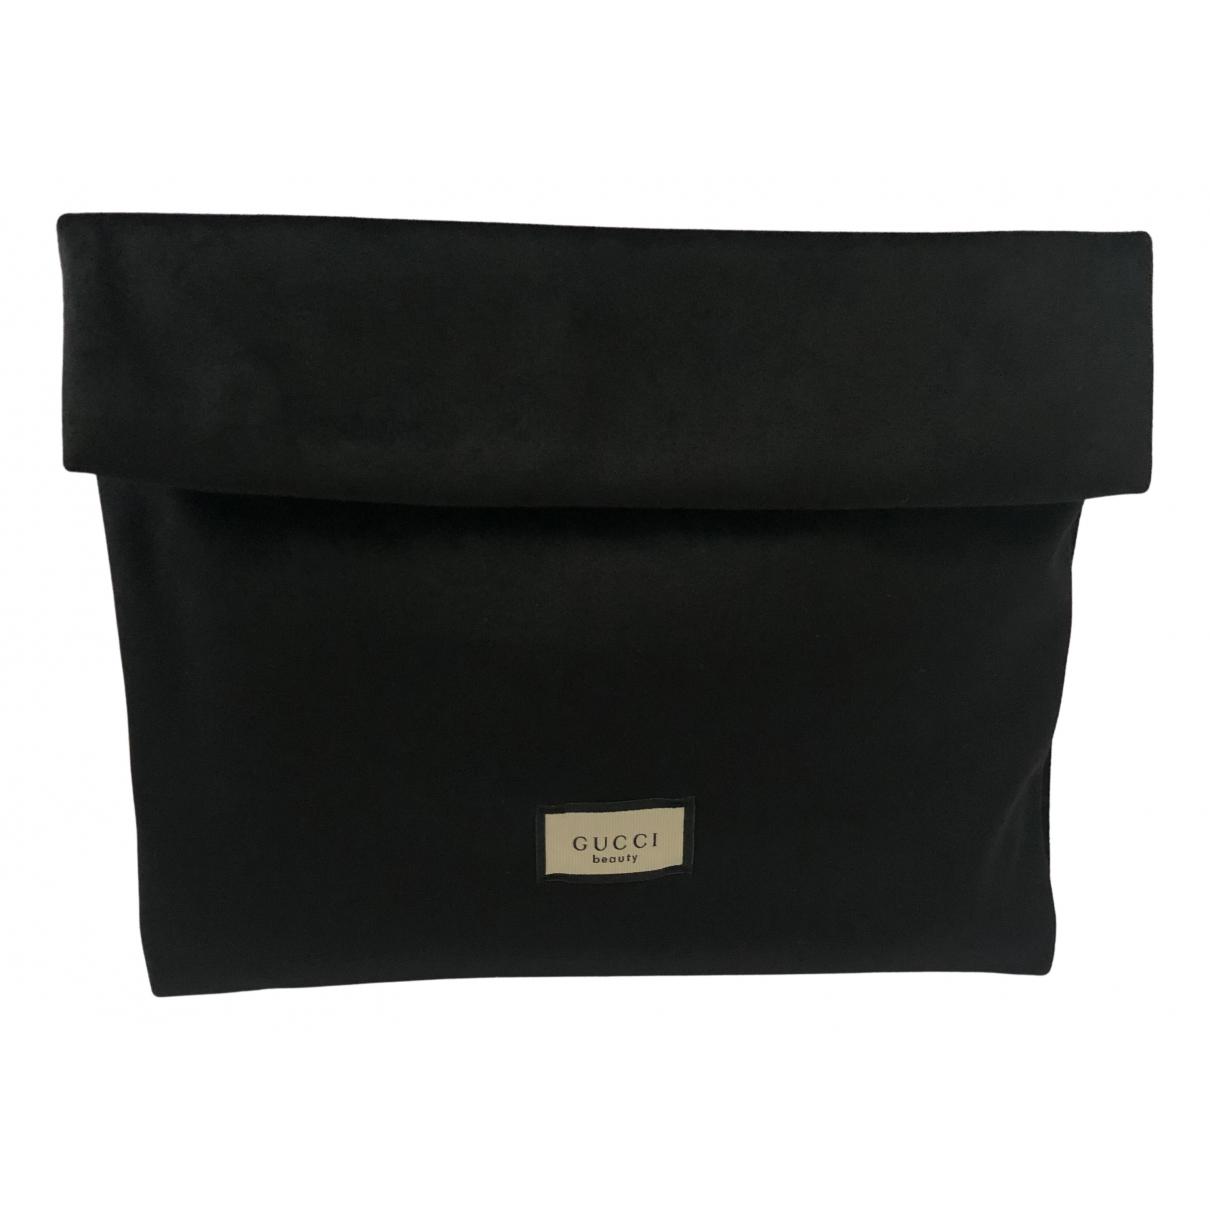 Bolsos clutch en Poliester Negro Gucci